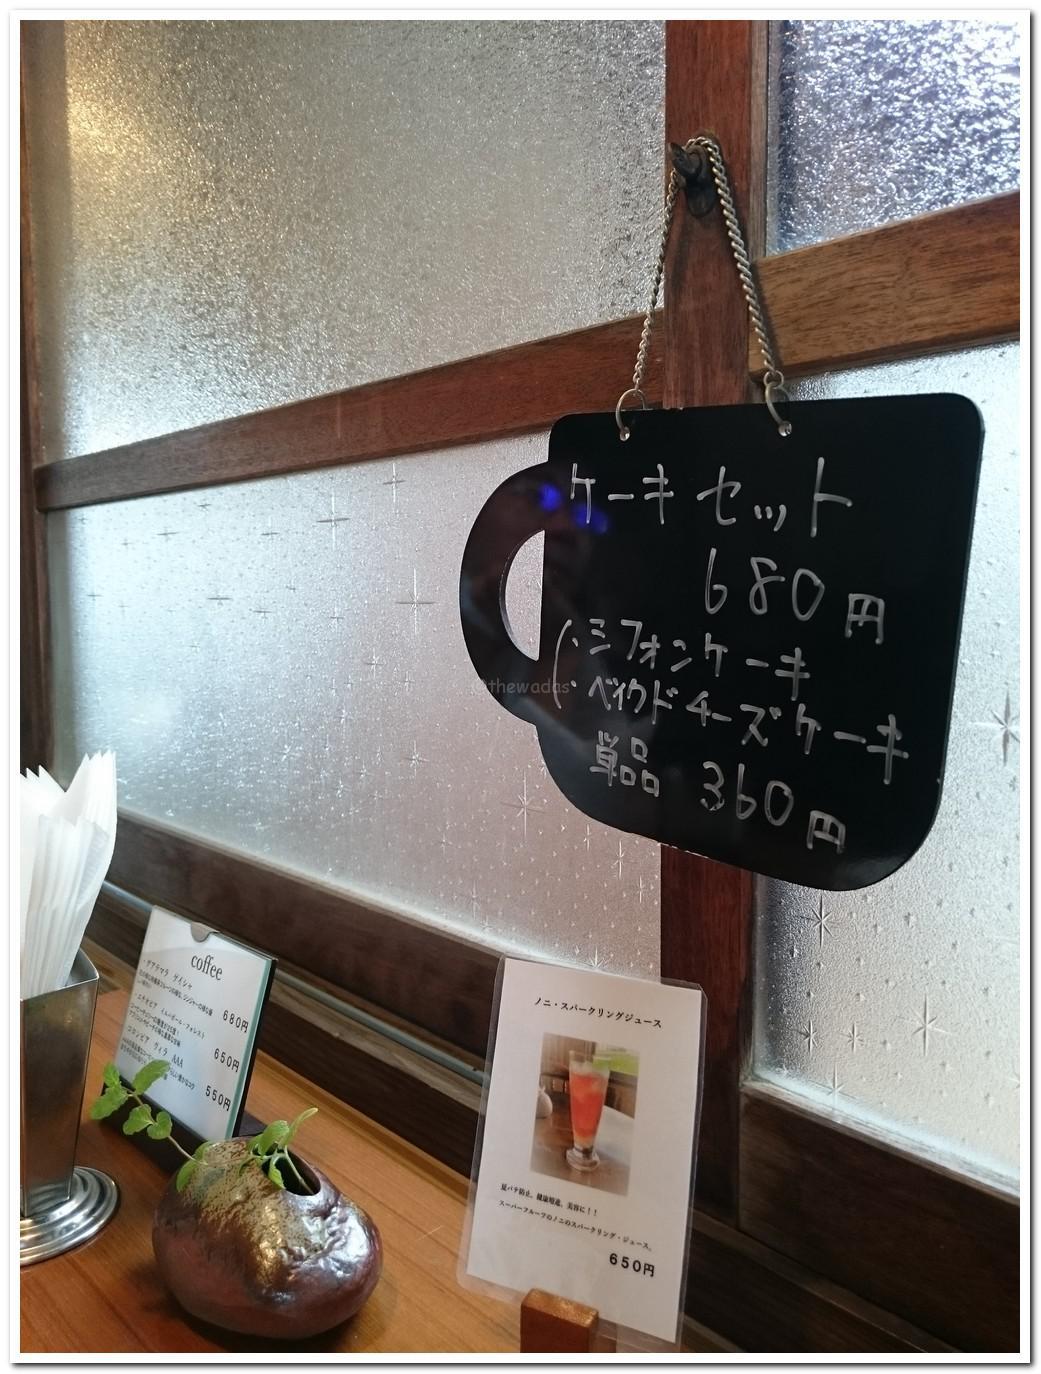 Cafe West in Setouchi City